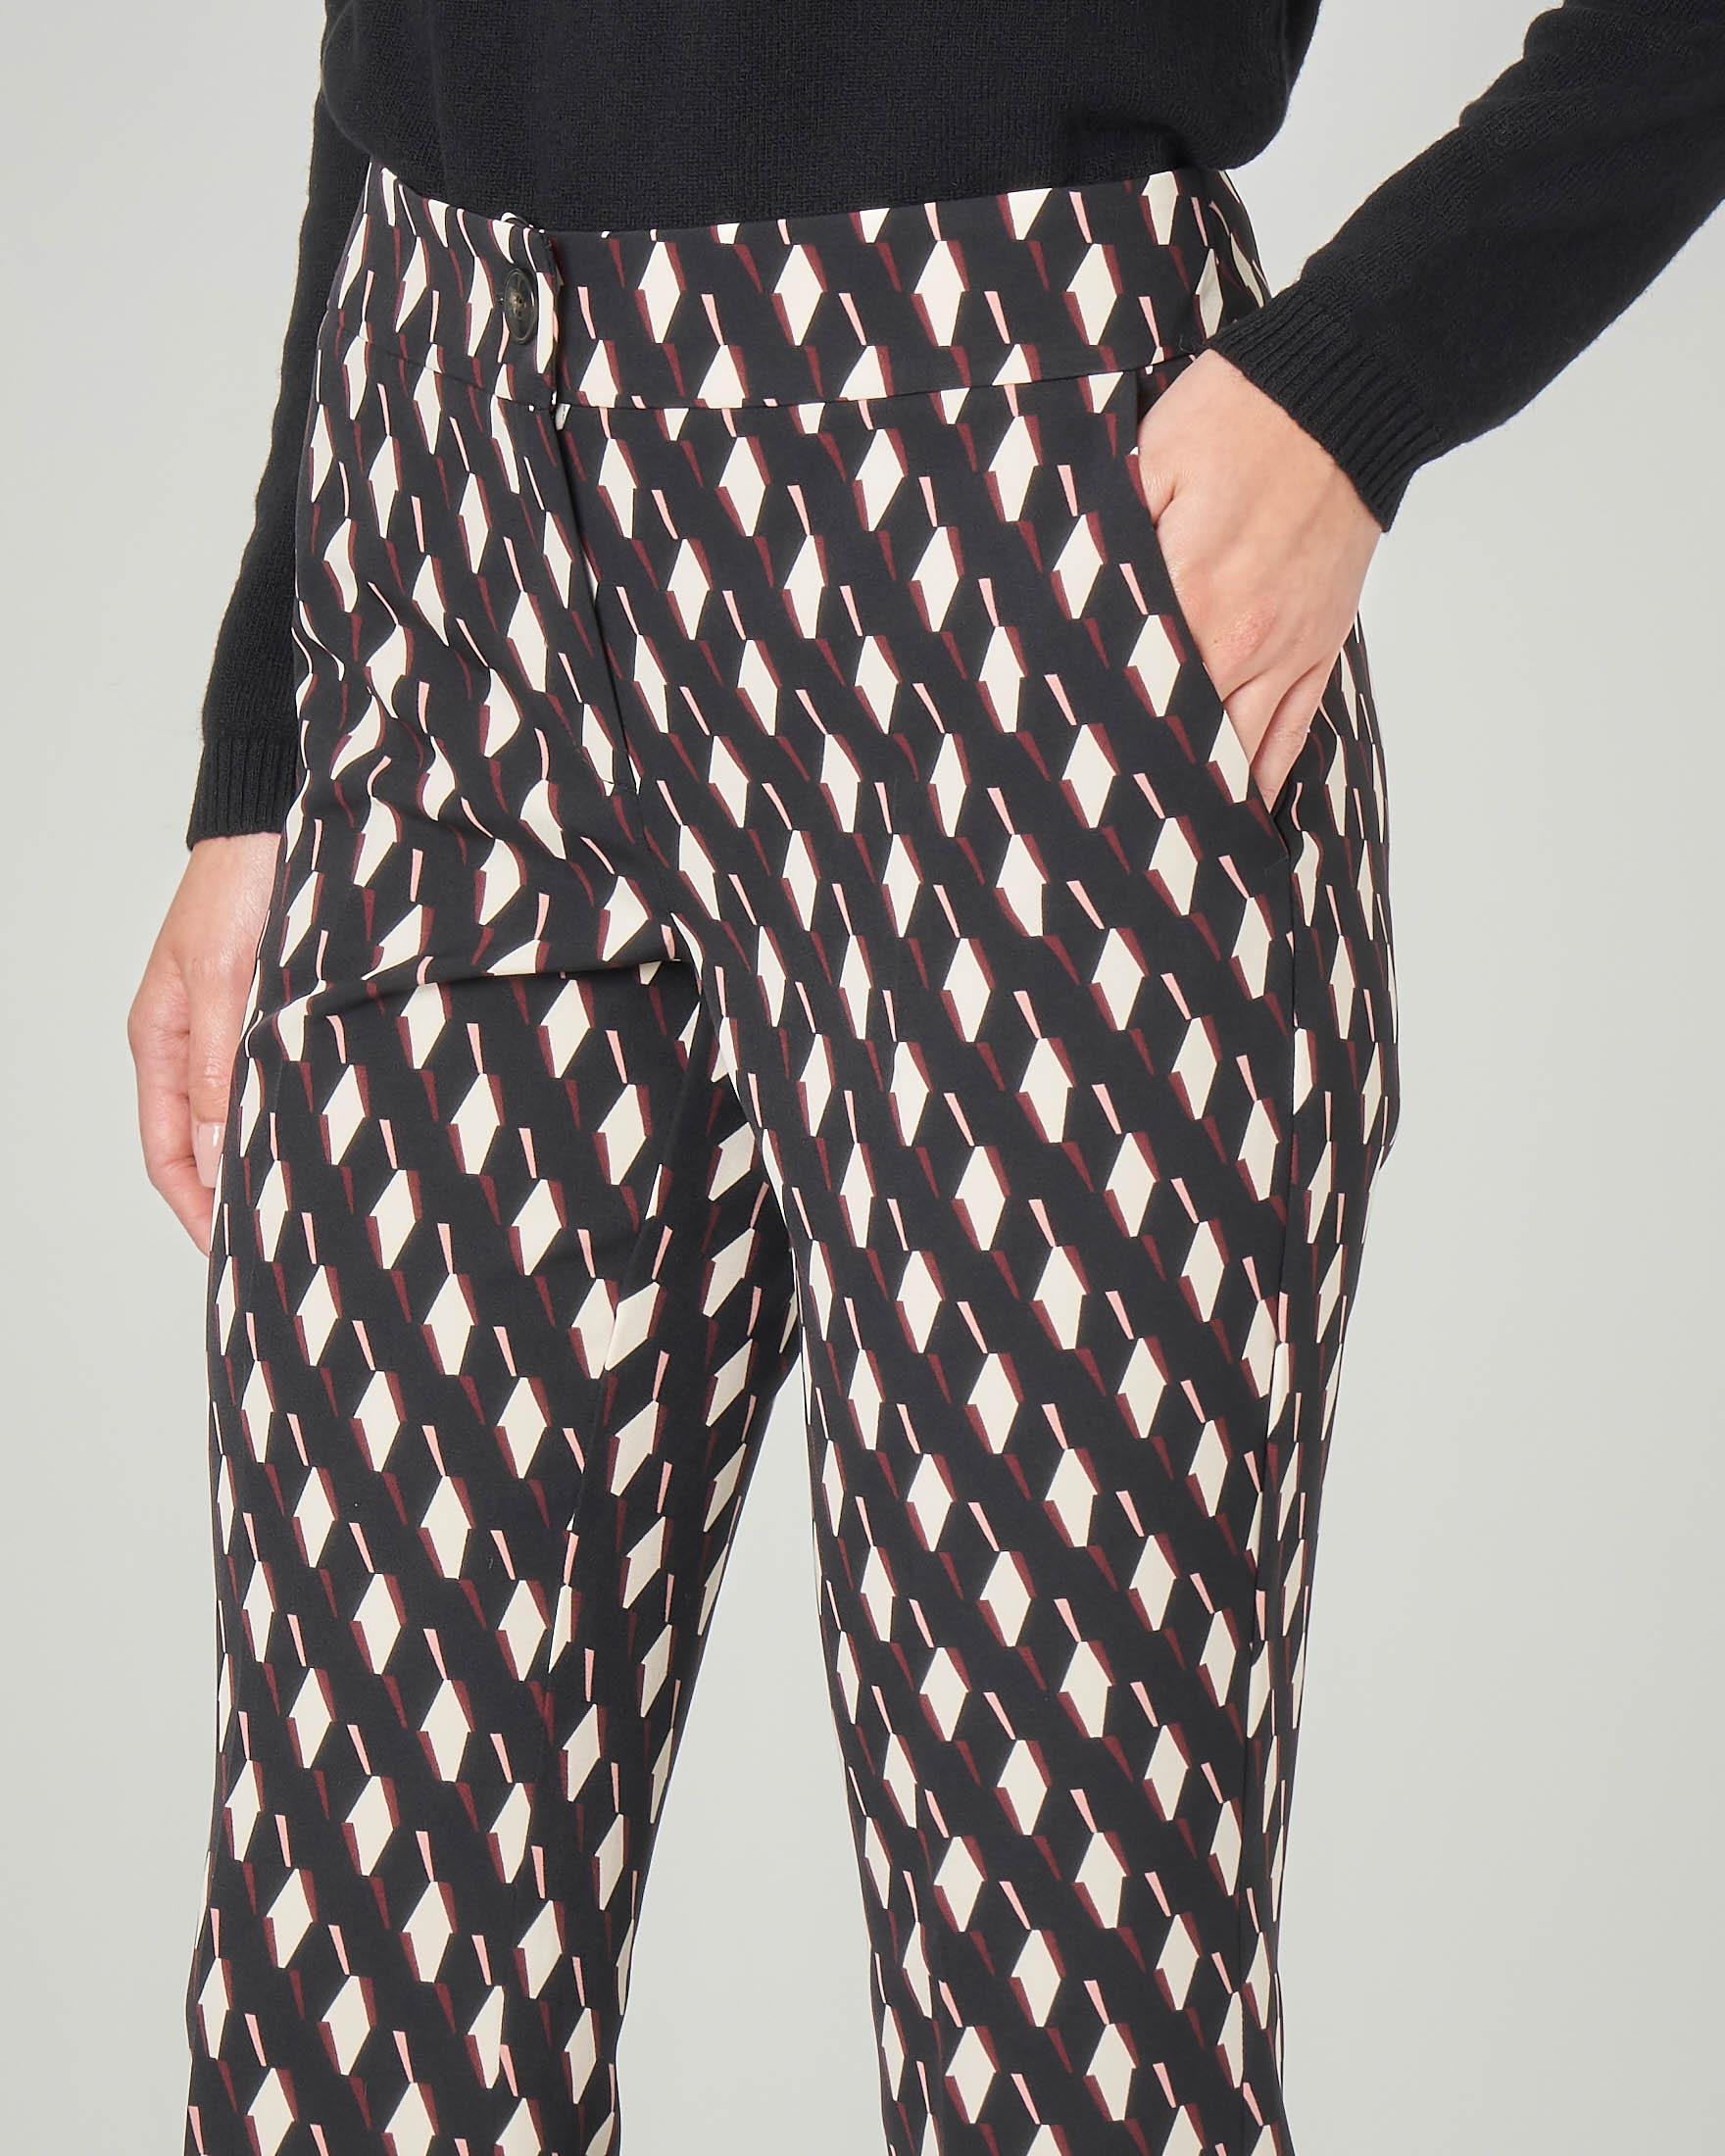 Pantaloni cropped in tessuto elasticizzato a fantasia geometrica bianca e rosa